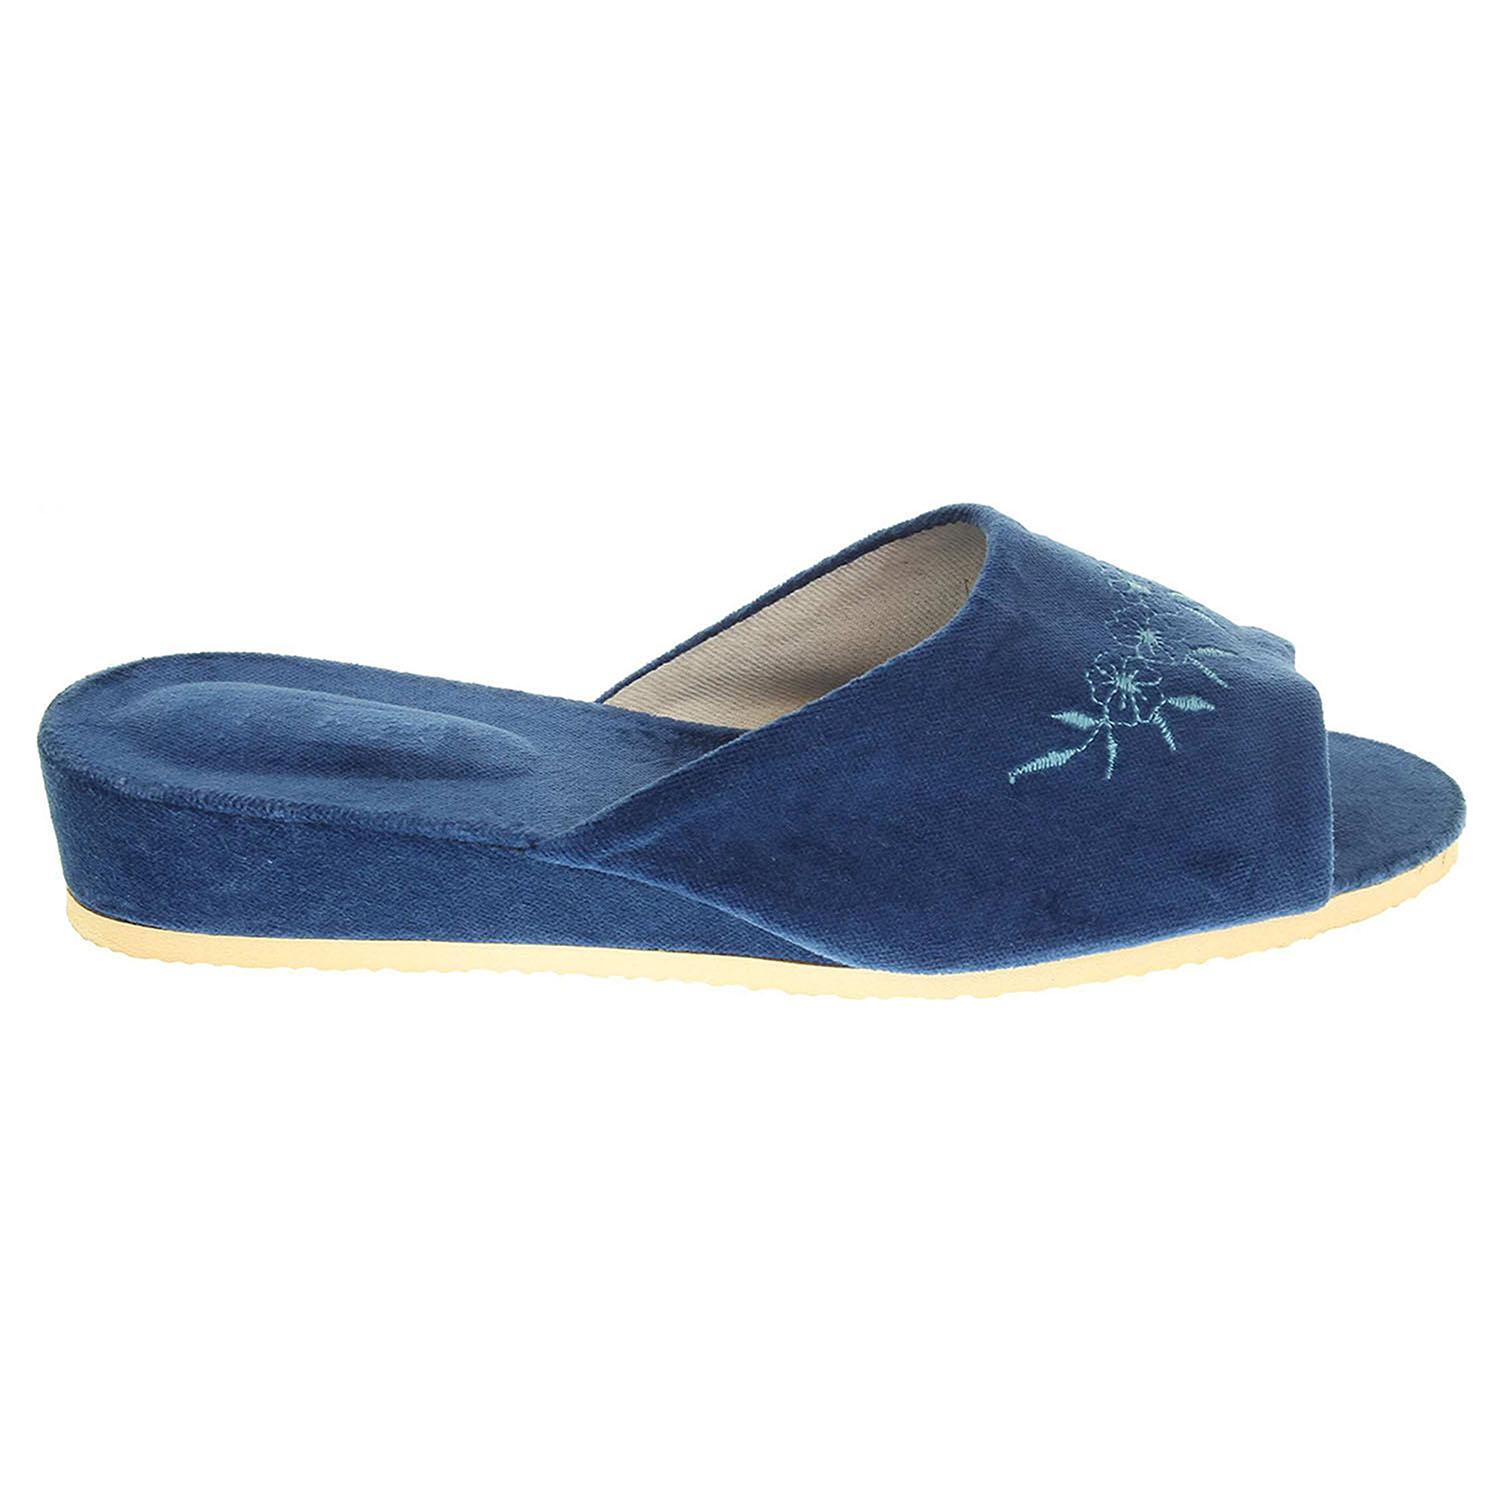 Ecco Domácí pantofle dámské 1030.00 modrá 23500305